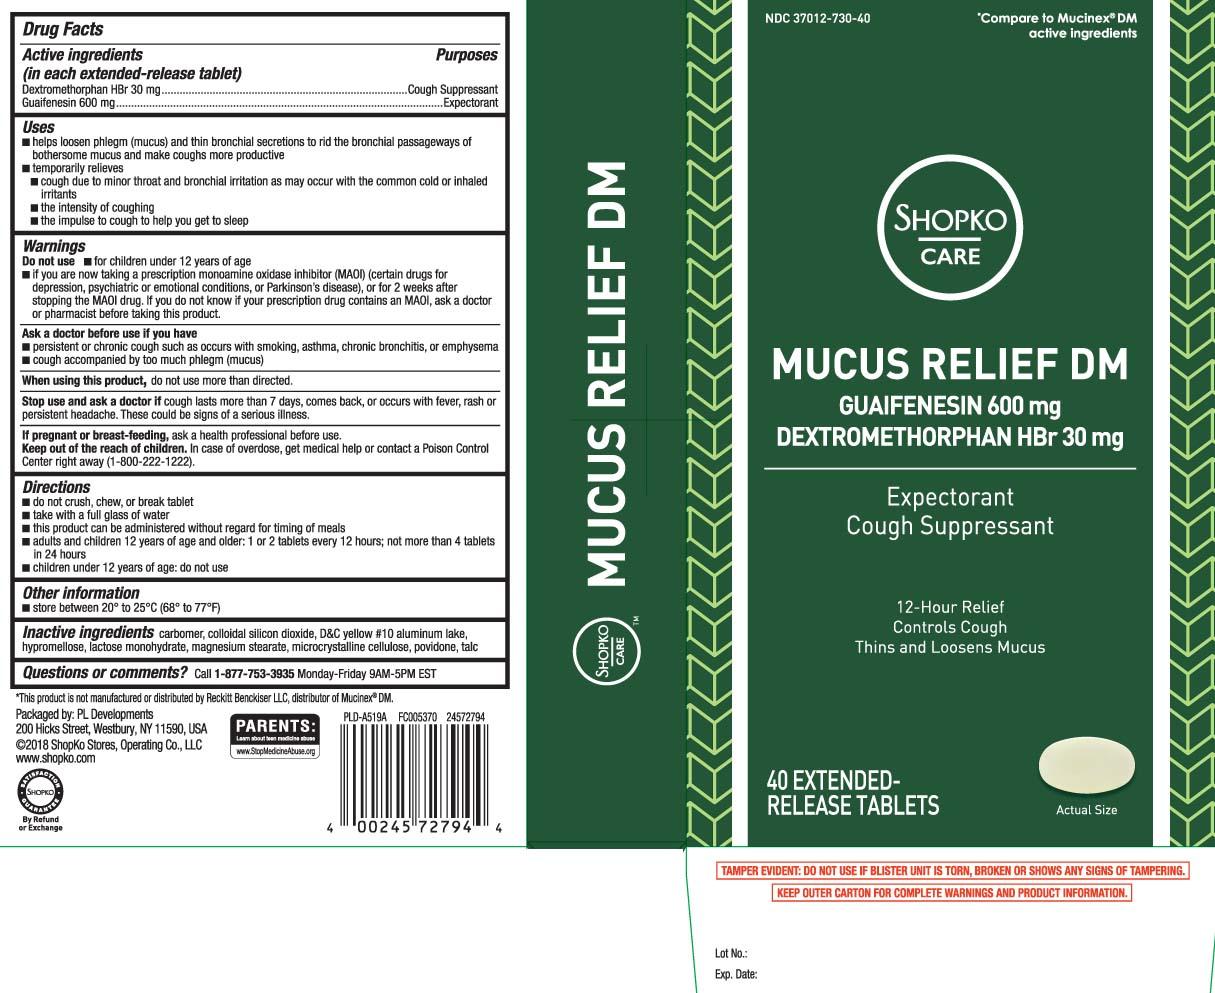 Dextromethorphan HBr 30 mg, Guaifenesin 600 mg